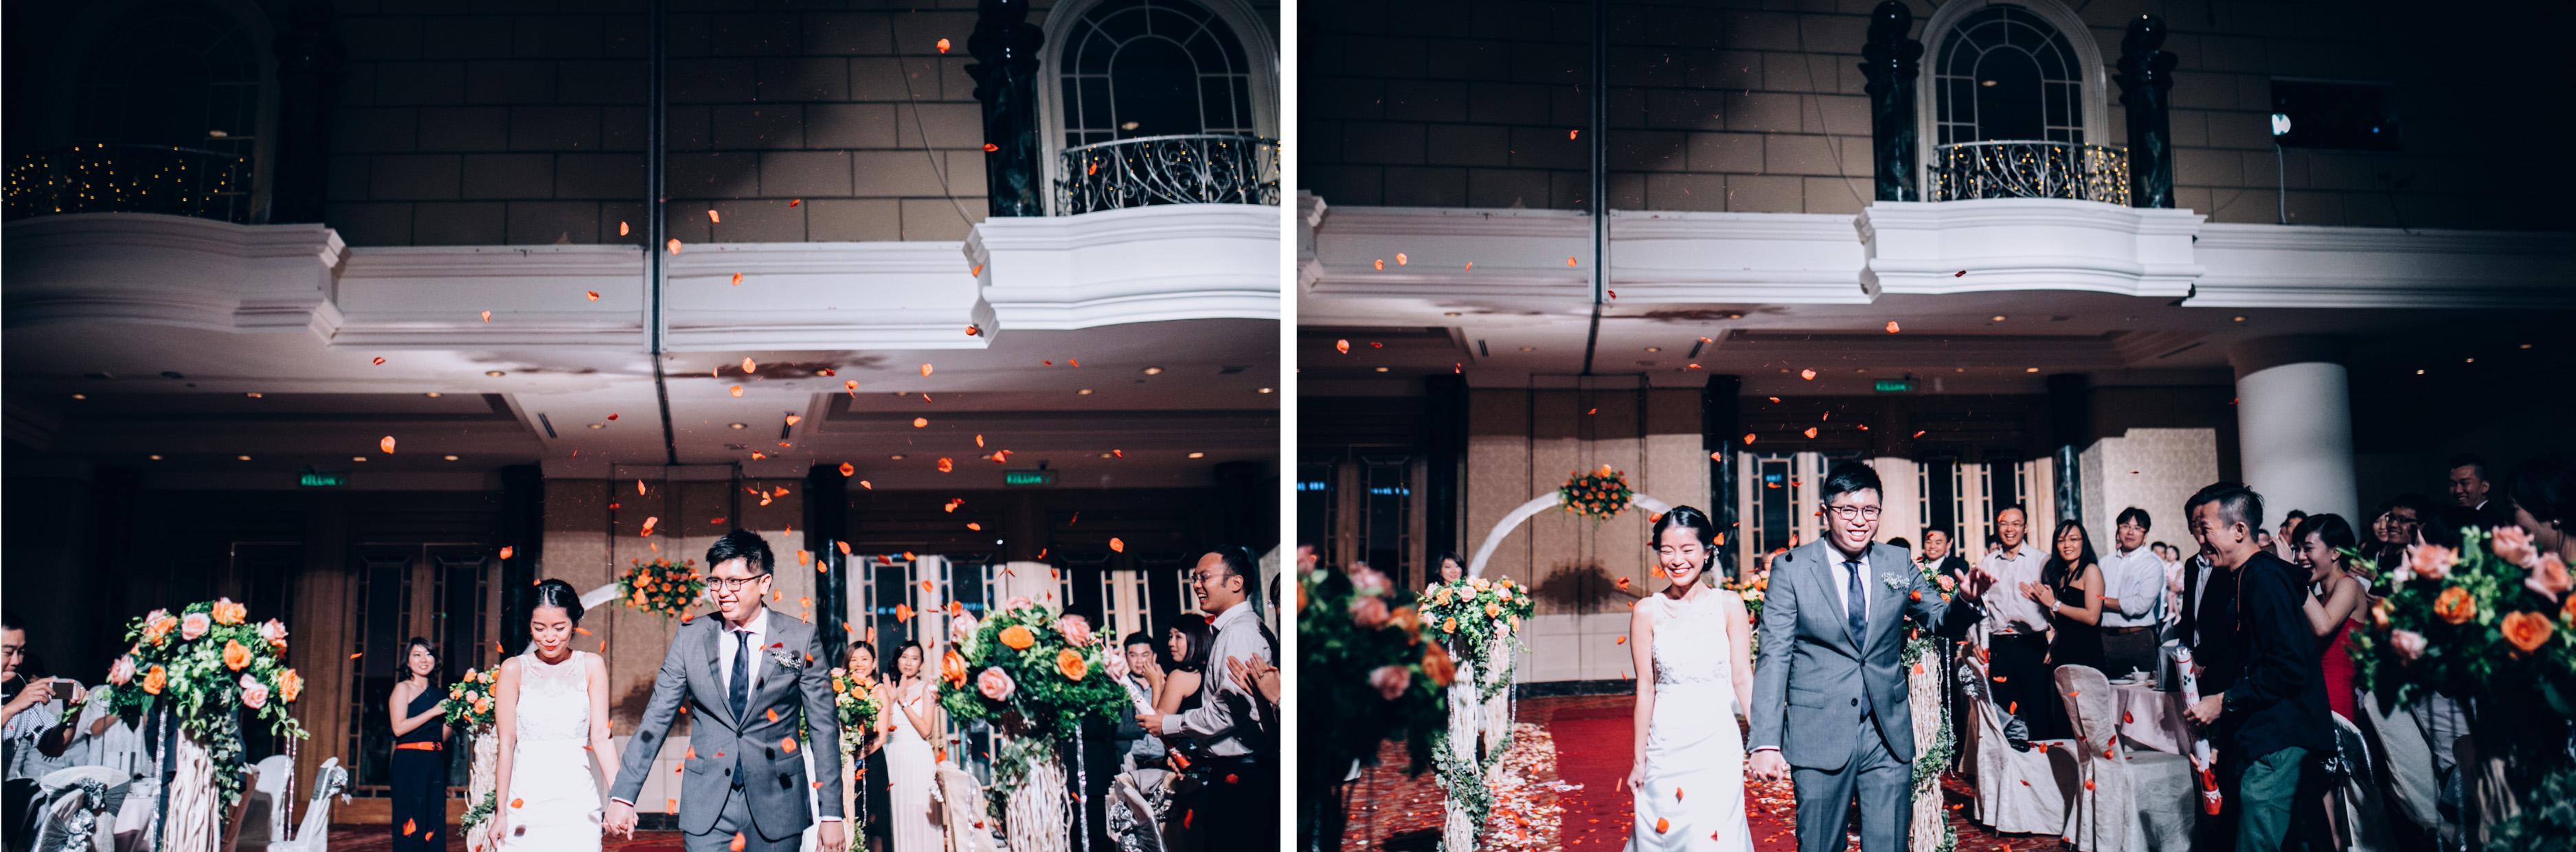 72-hellojanelee-malaysia-wedding-photographer-lake-garden-tinajackson-prewedding